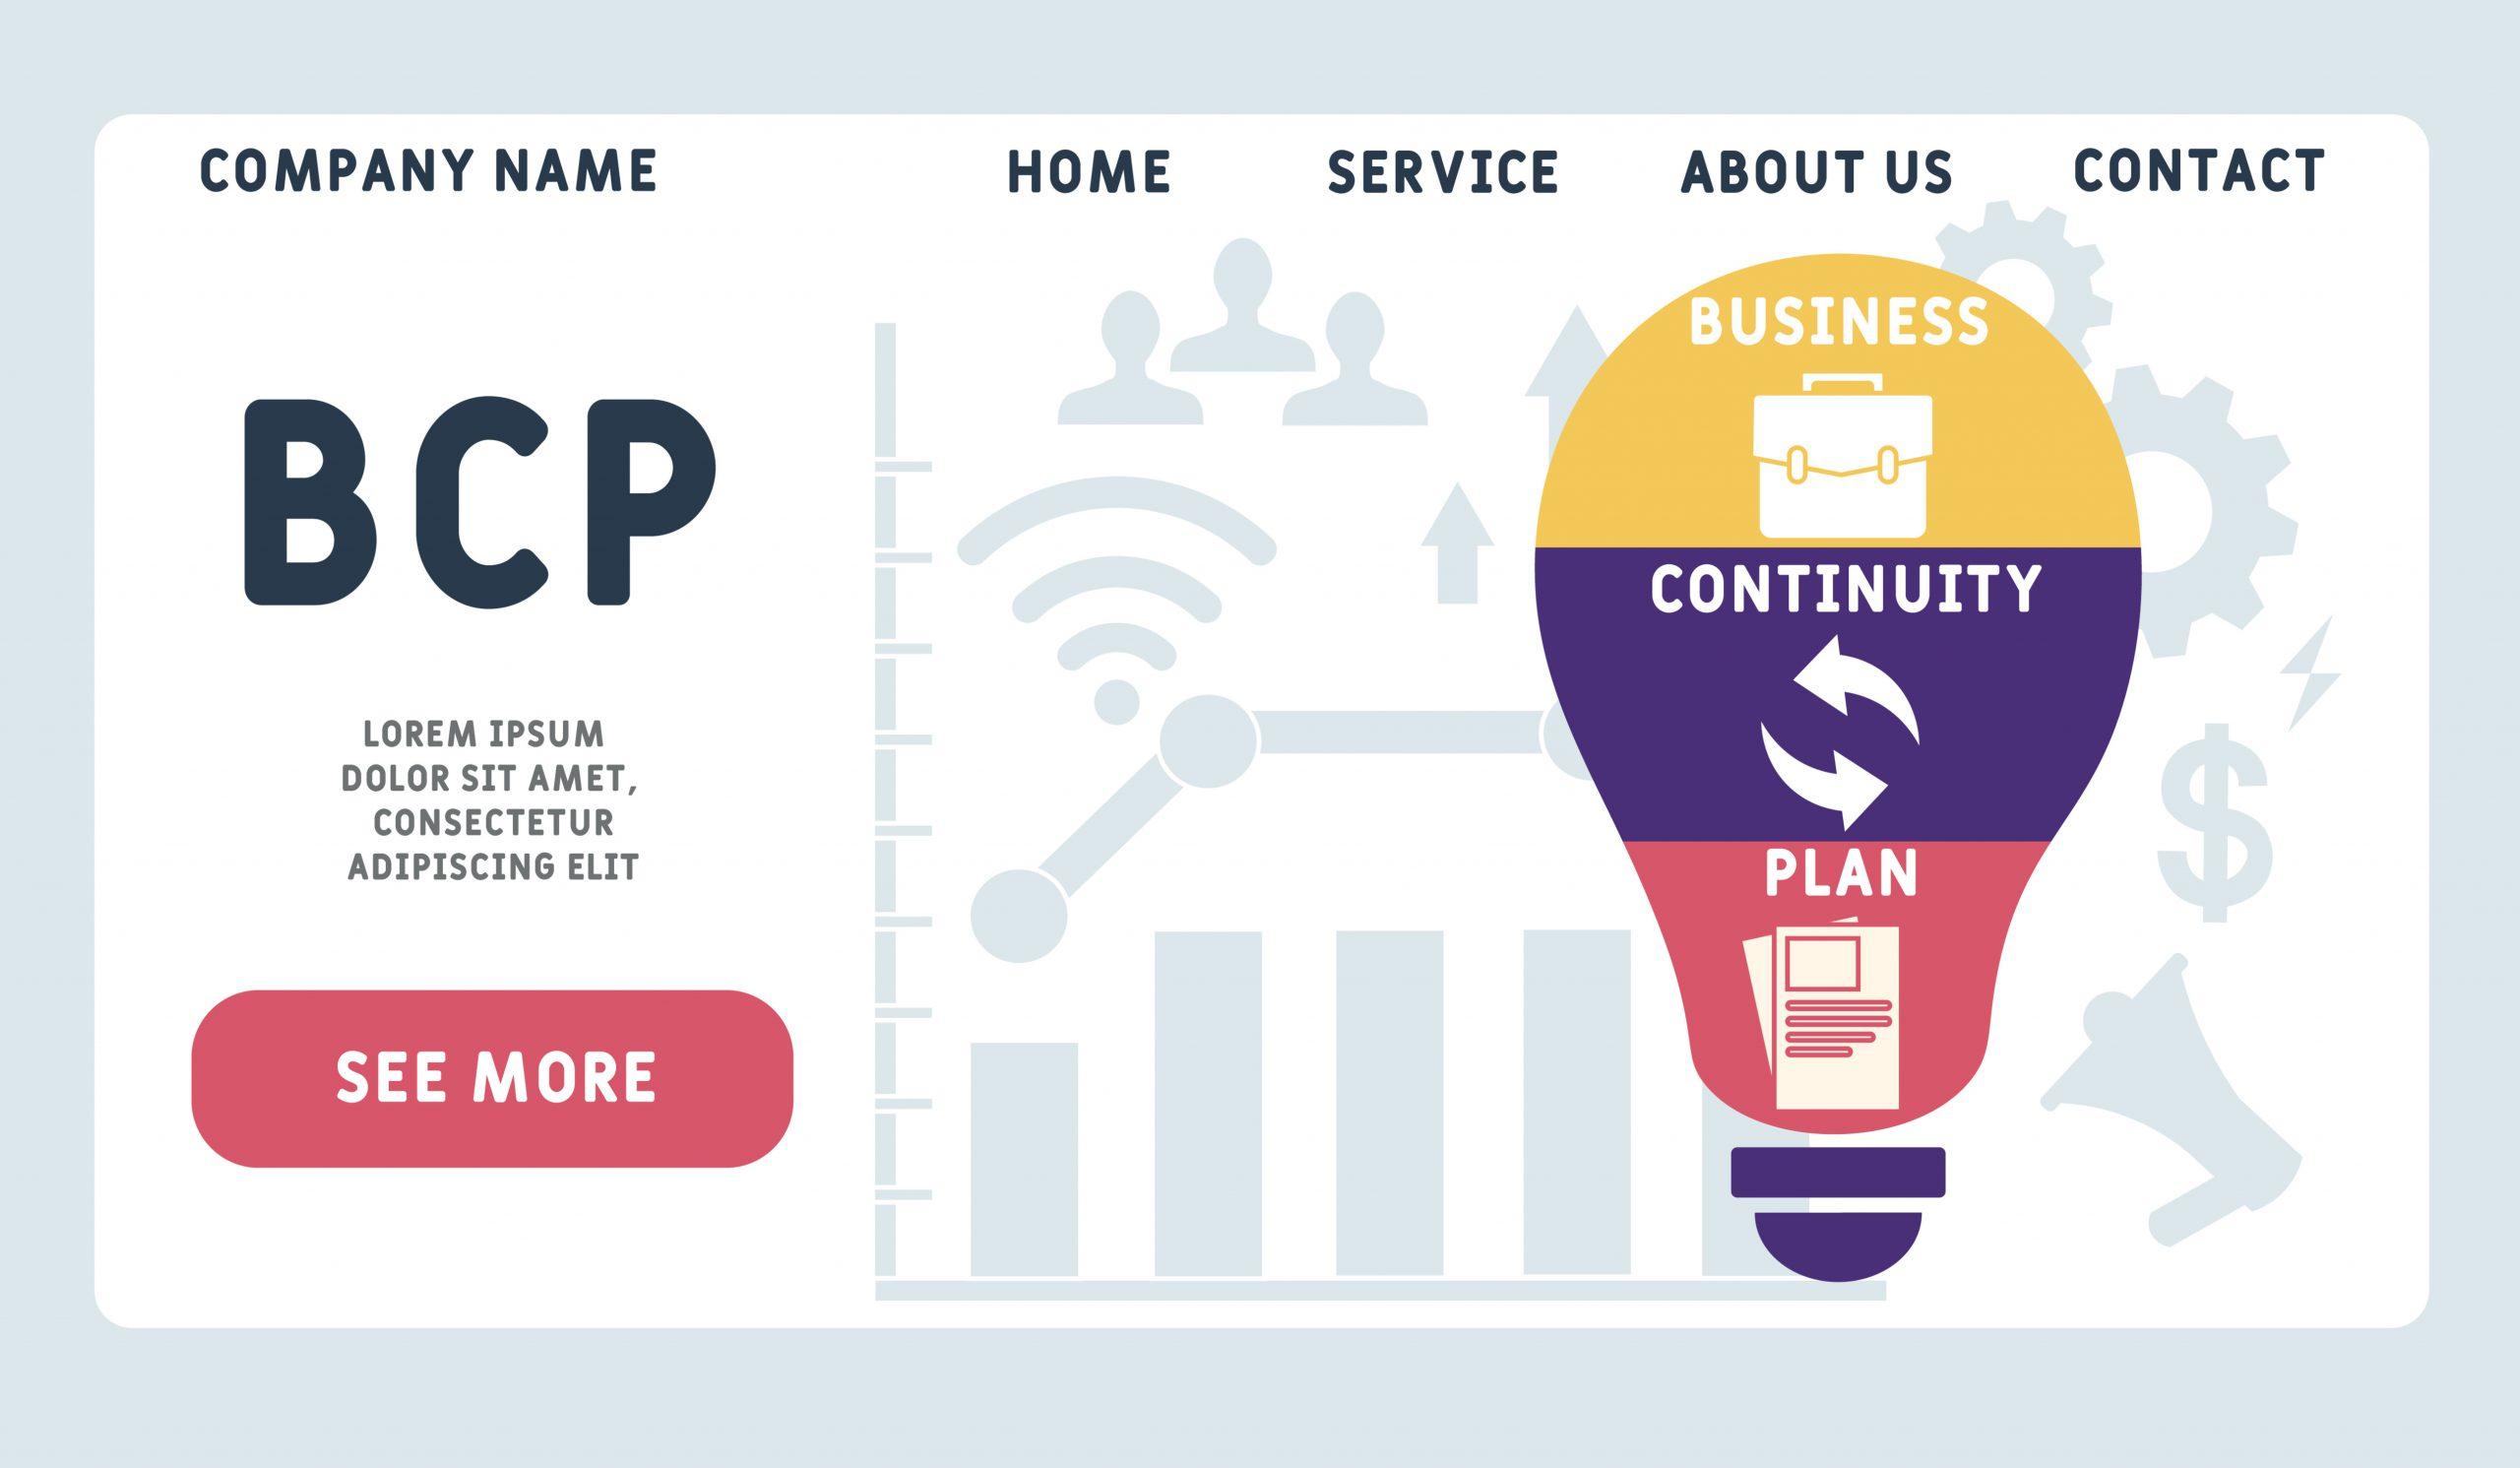 BCPを策定・運用する効果について